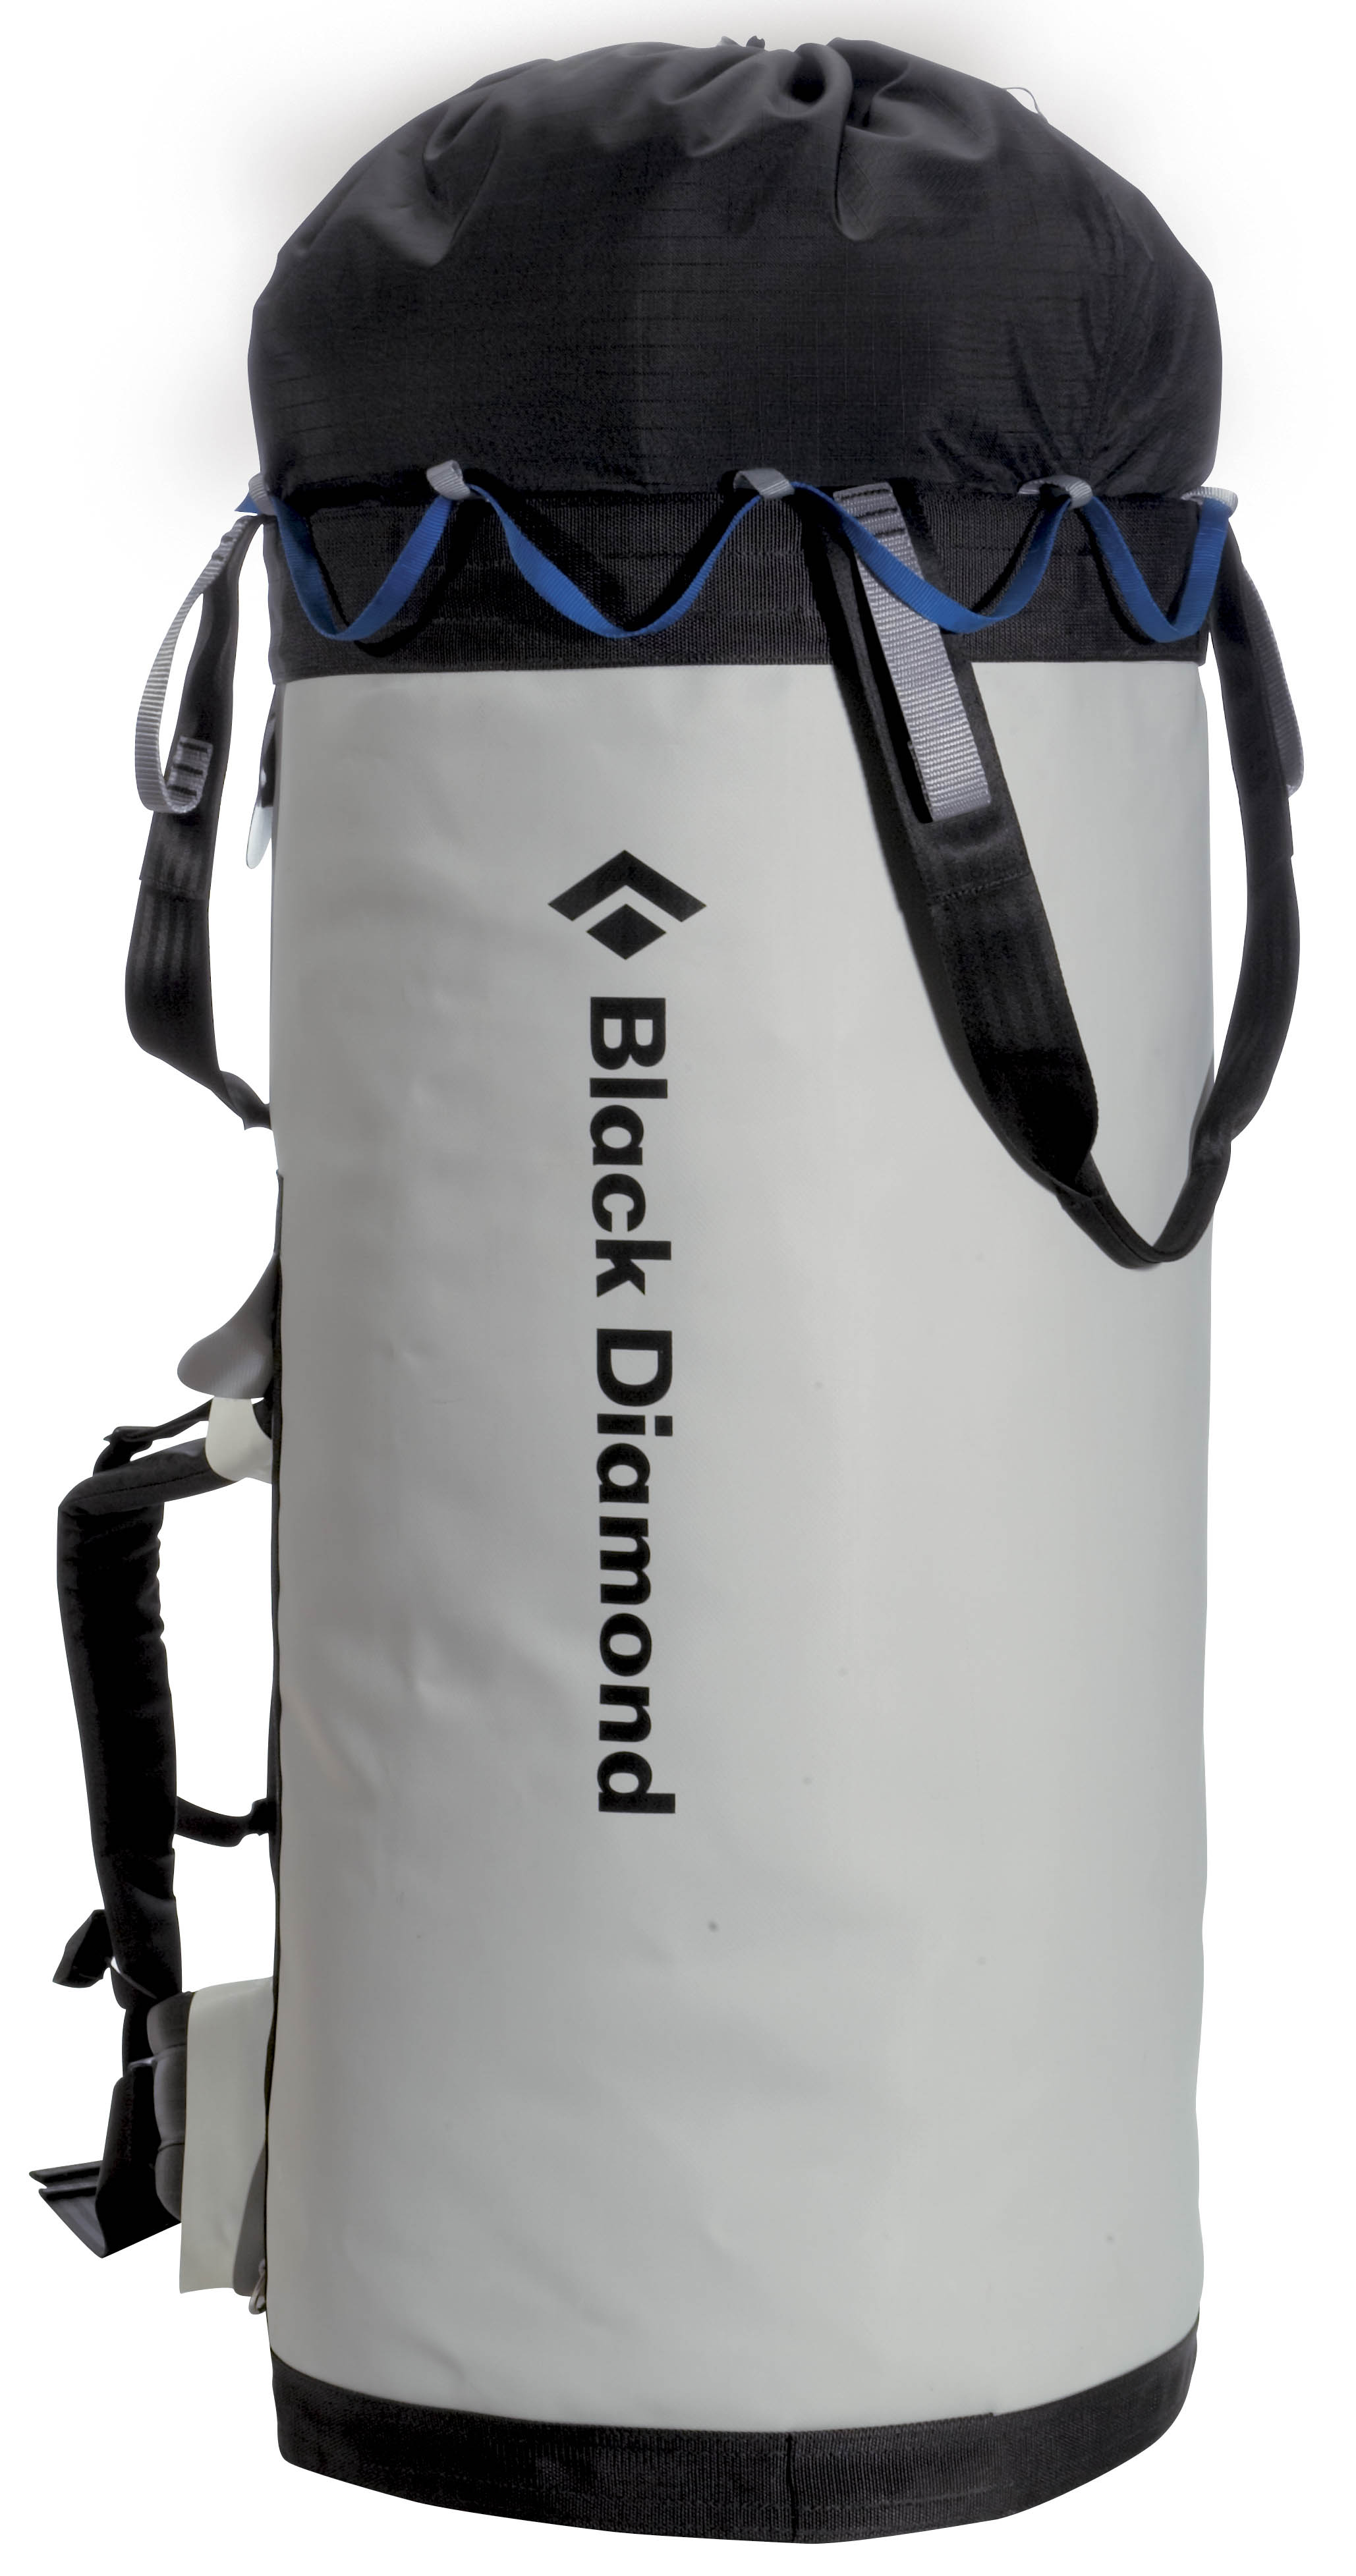 Black Diamond - Zion 145 Haul Bag